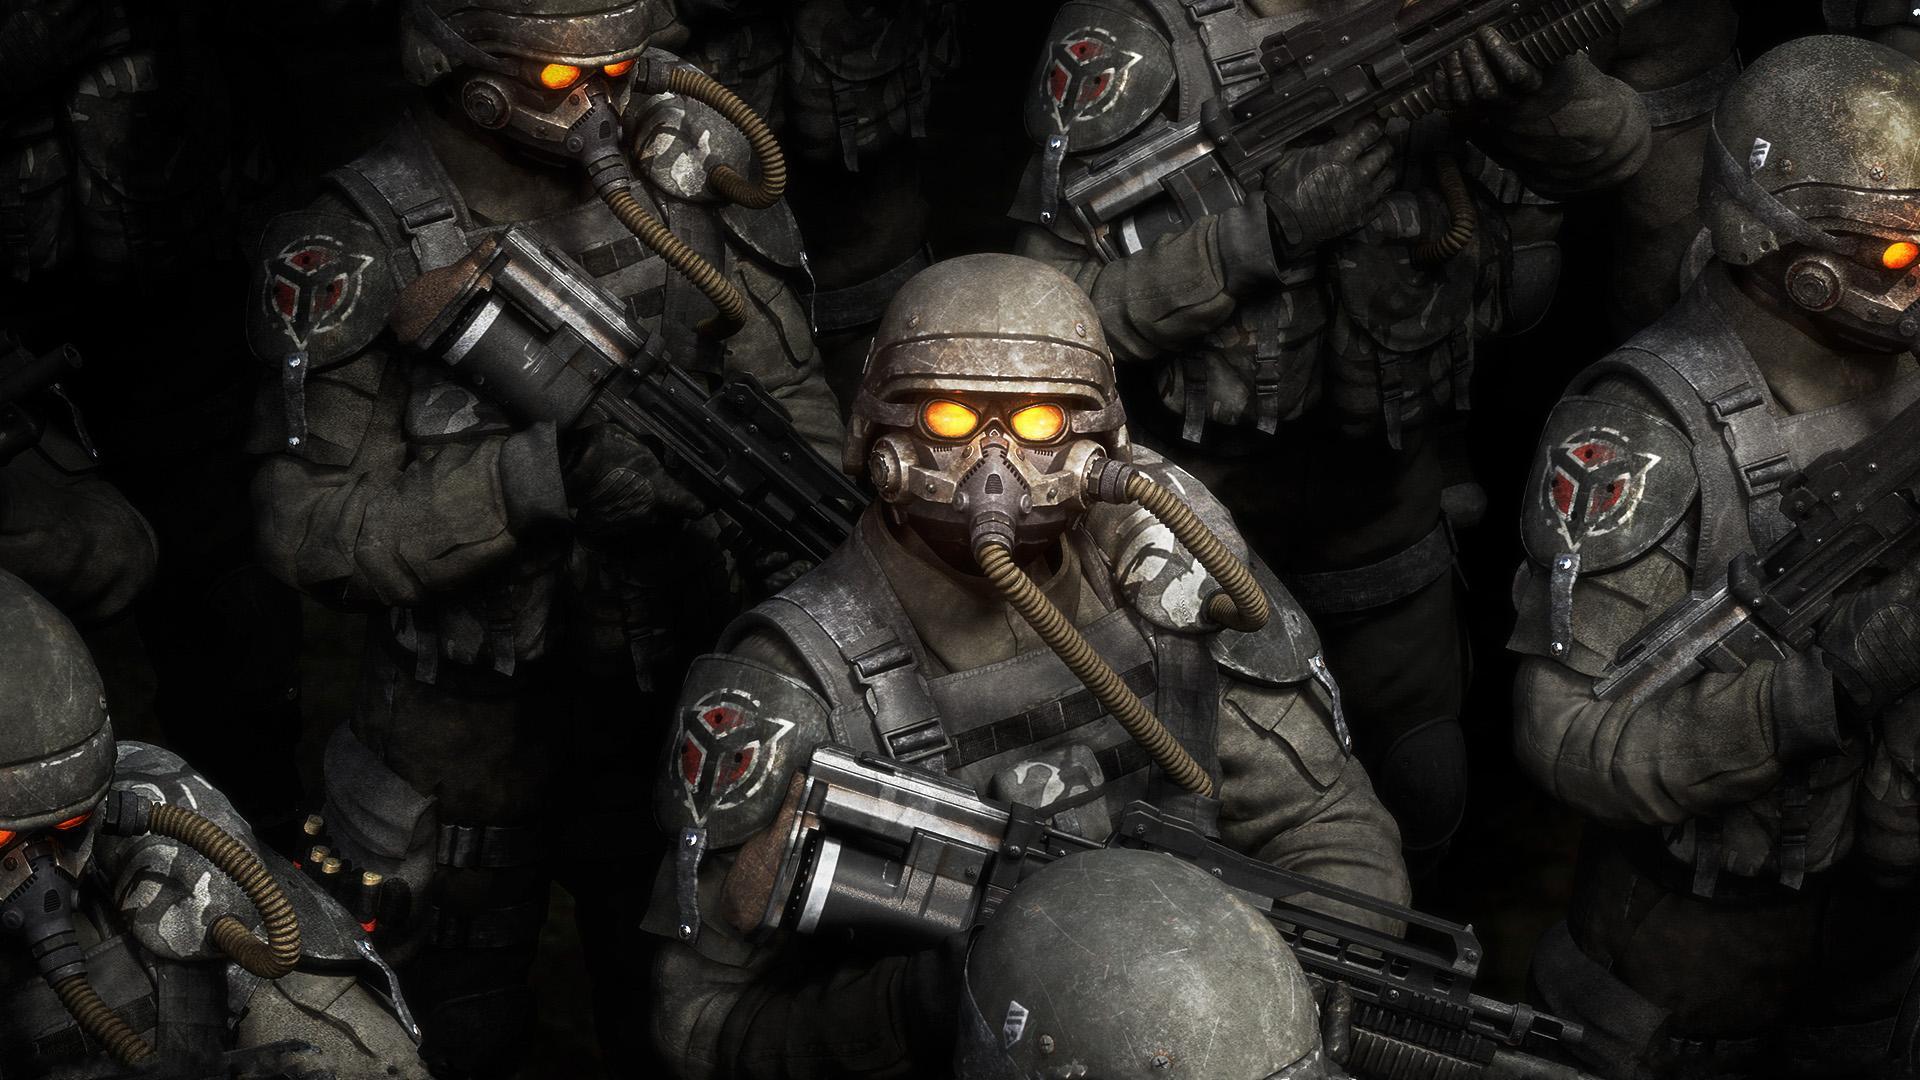 Wallpaper Gun Eyes Soldier Killzone Army Person